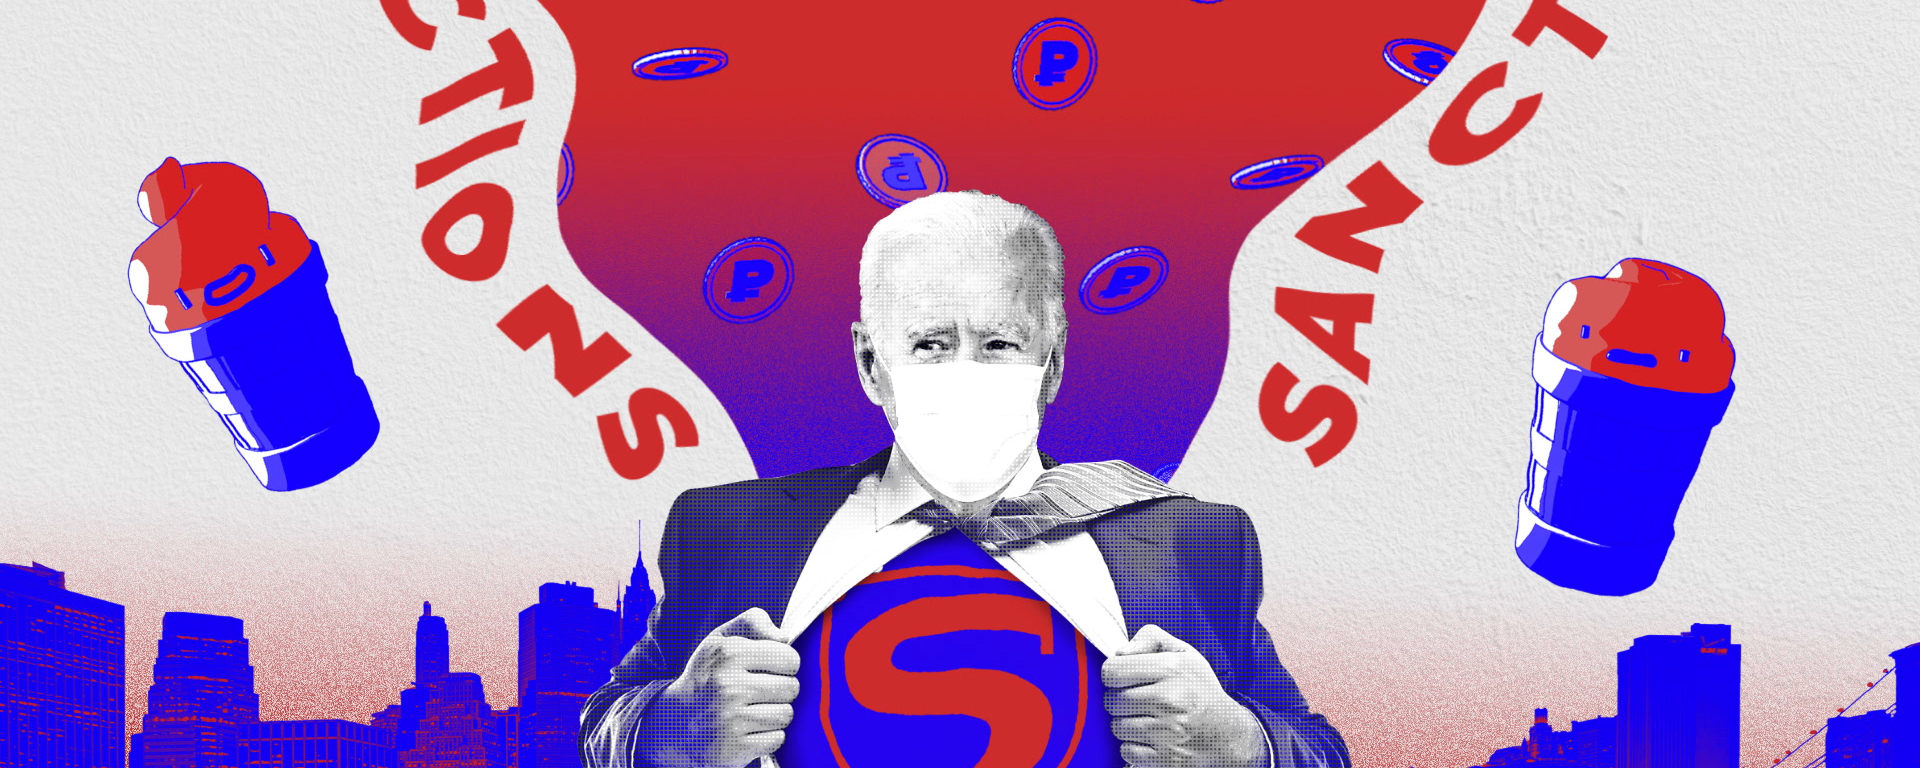 USA, i primi 100 giorni di Biden da presidente - Sputnik Italia, 1920, 29.04.2021